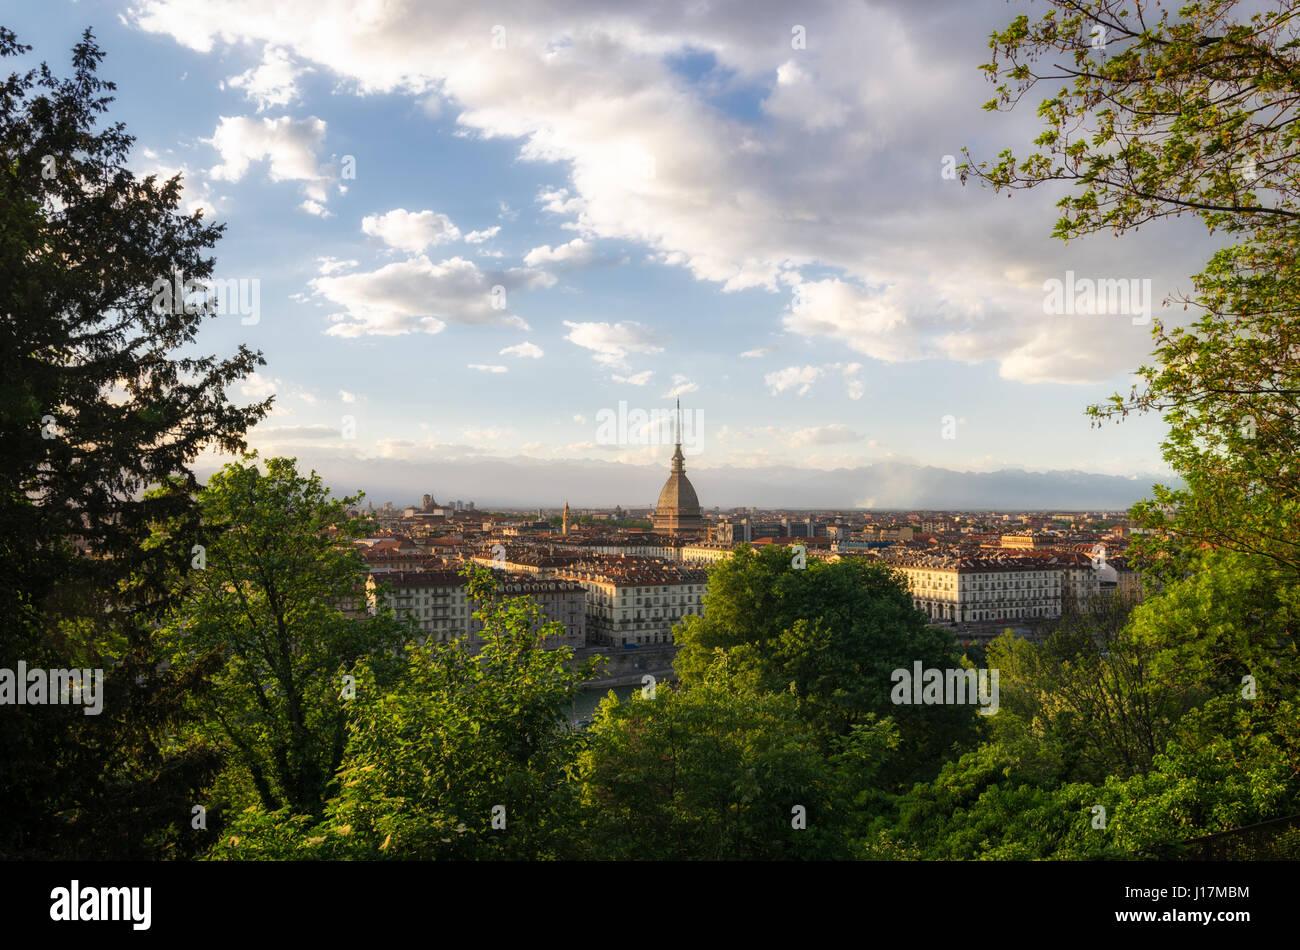 Turín panorama escénico con Mole Antonelliana al atardecer Foto de stock